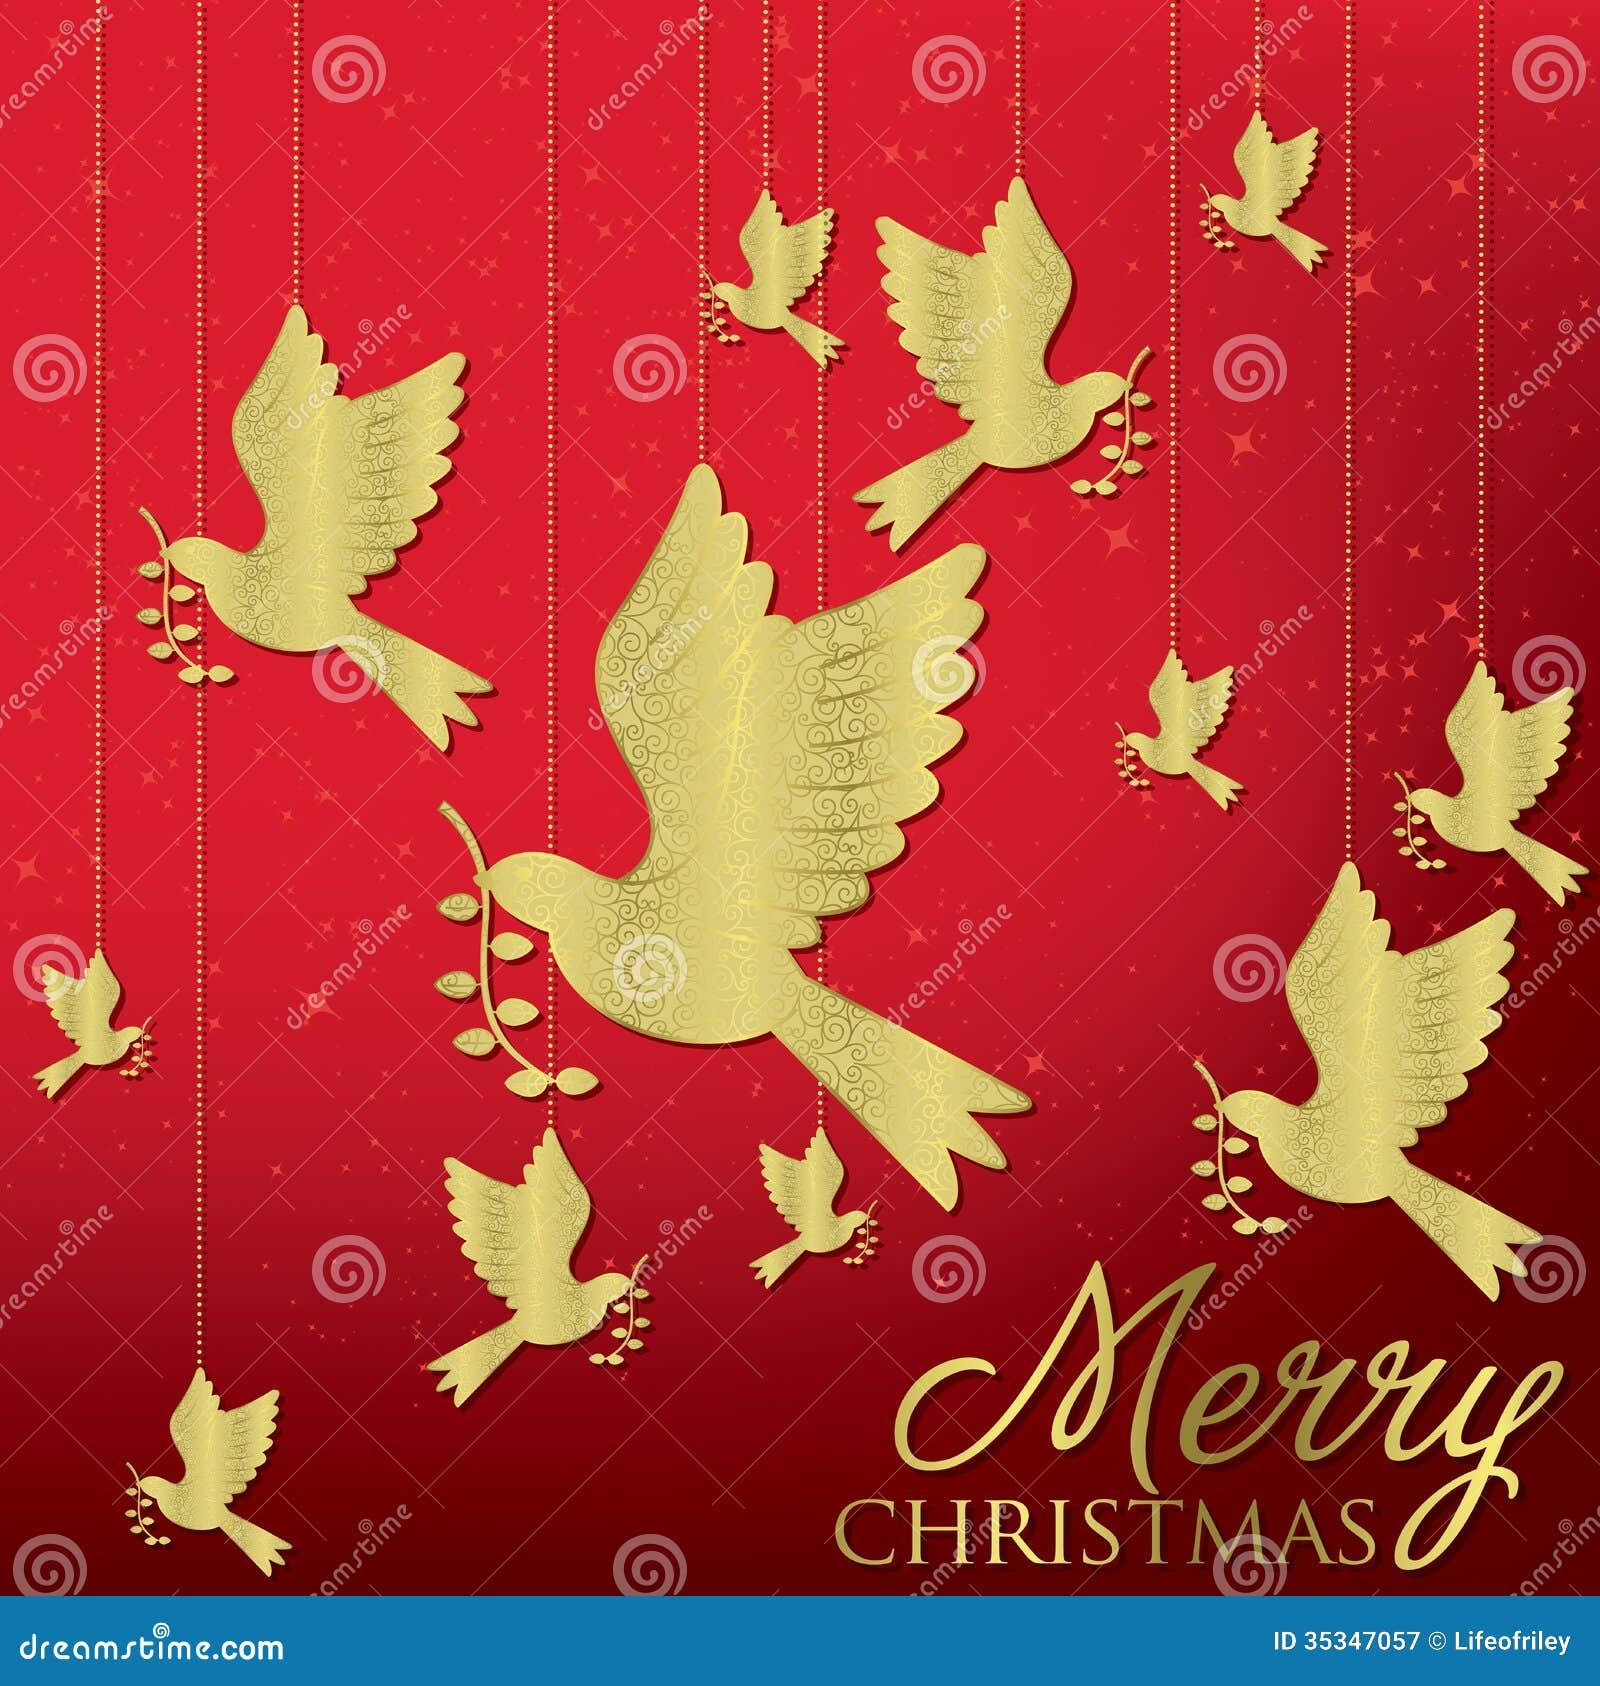 Elegant Christmas Clip Art Free